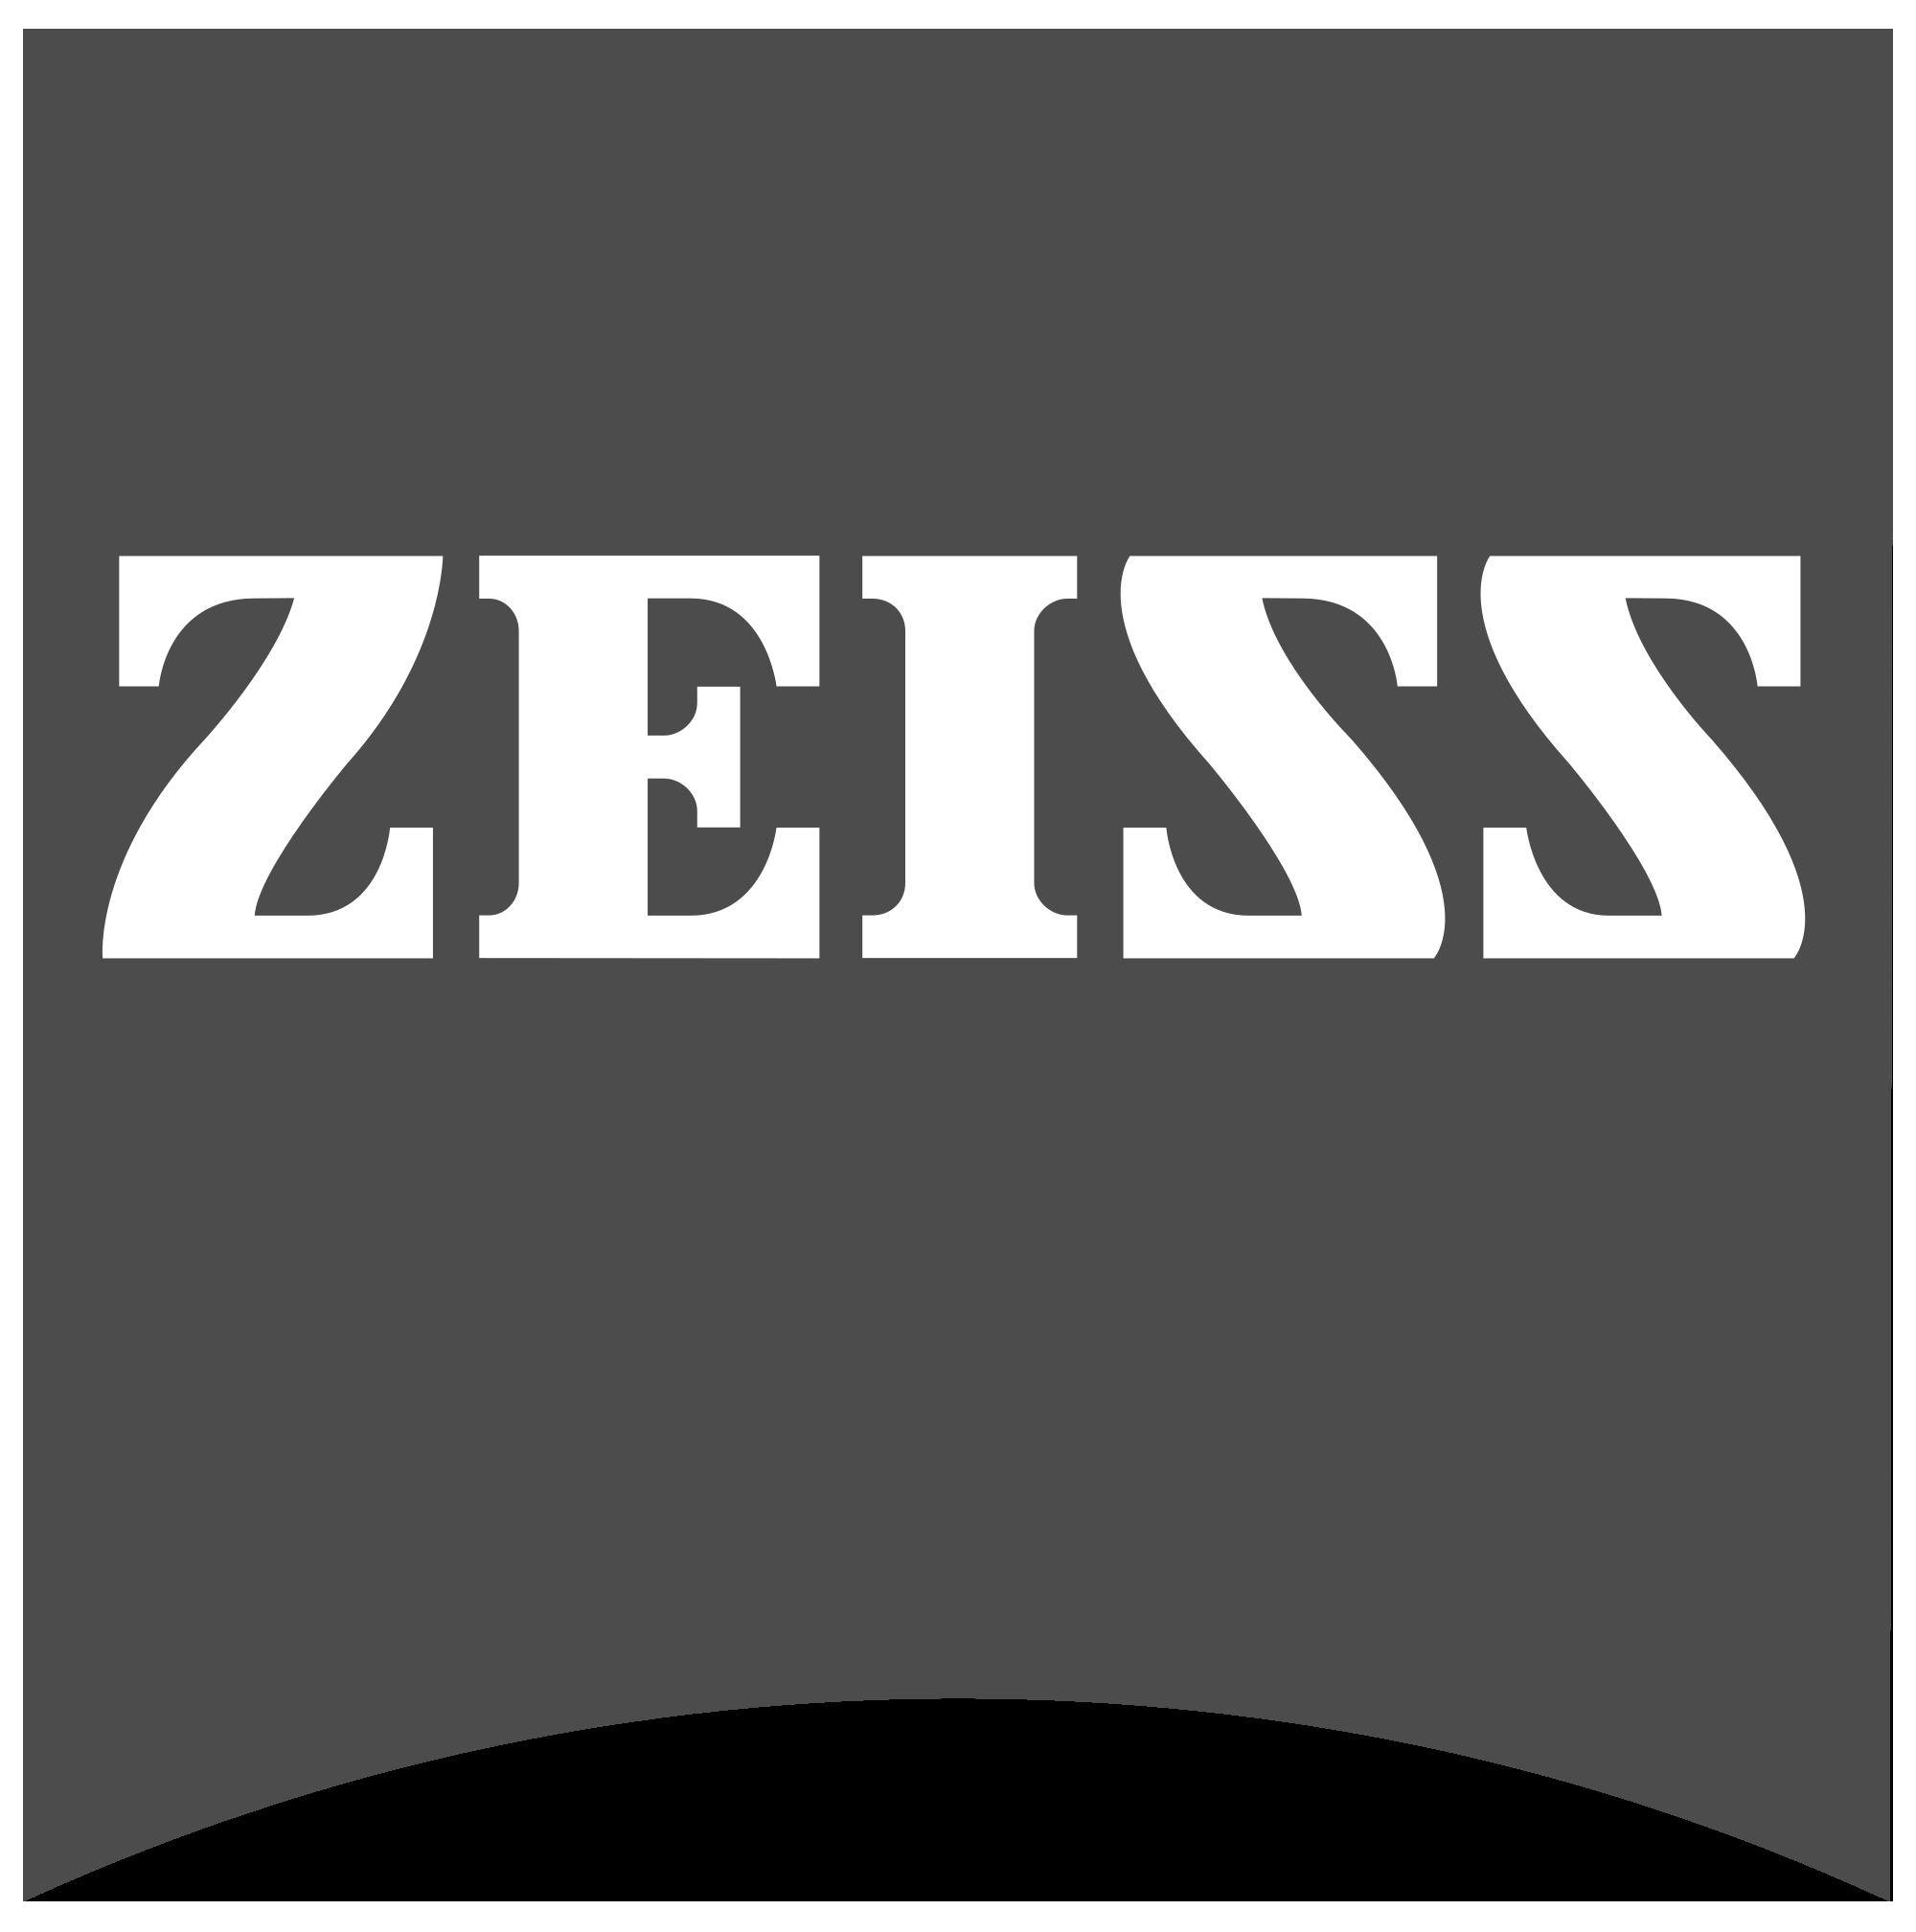 zeiss copy.png